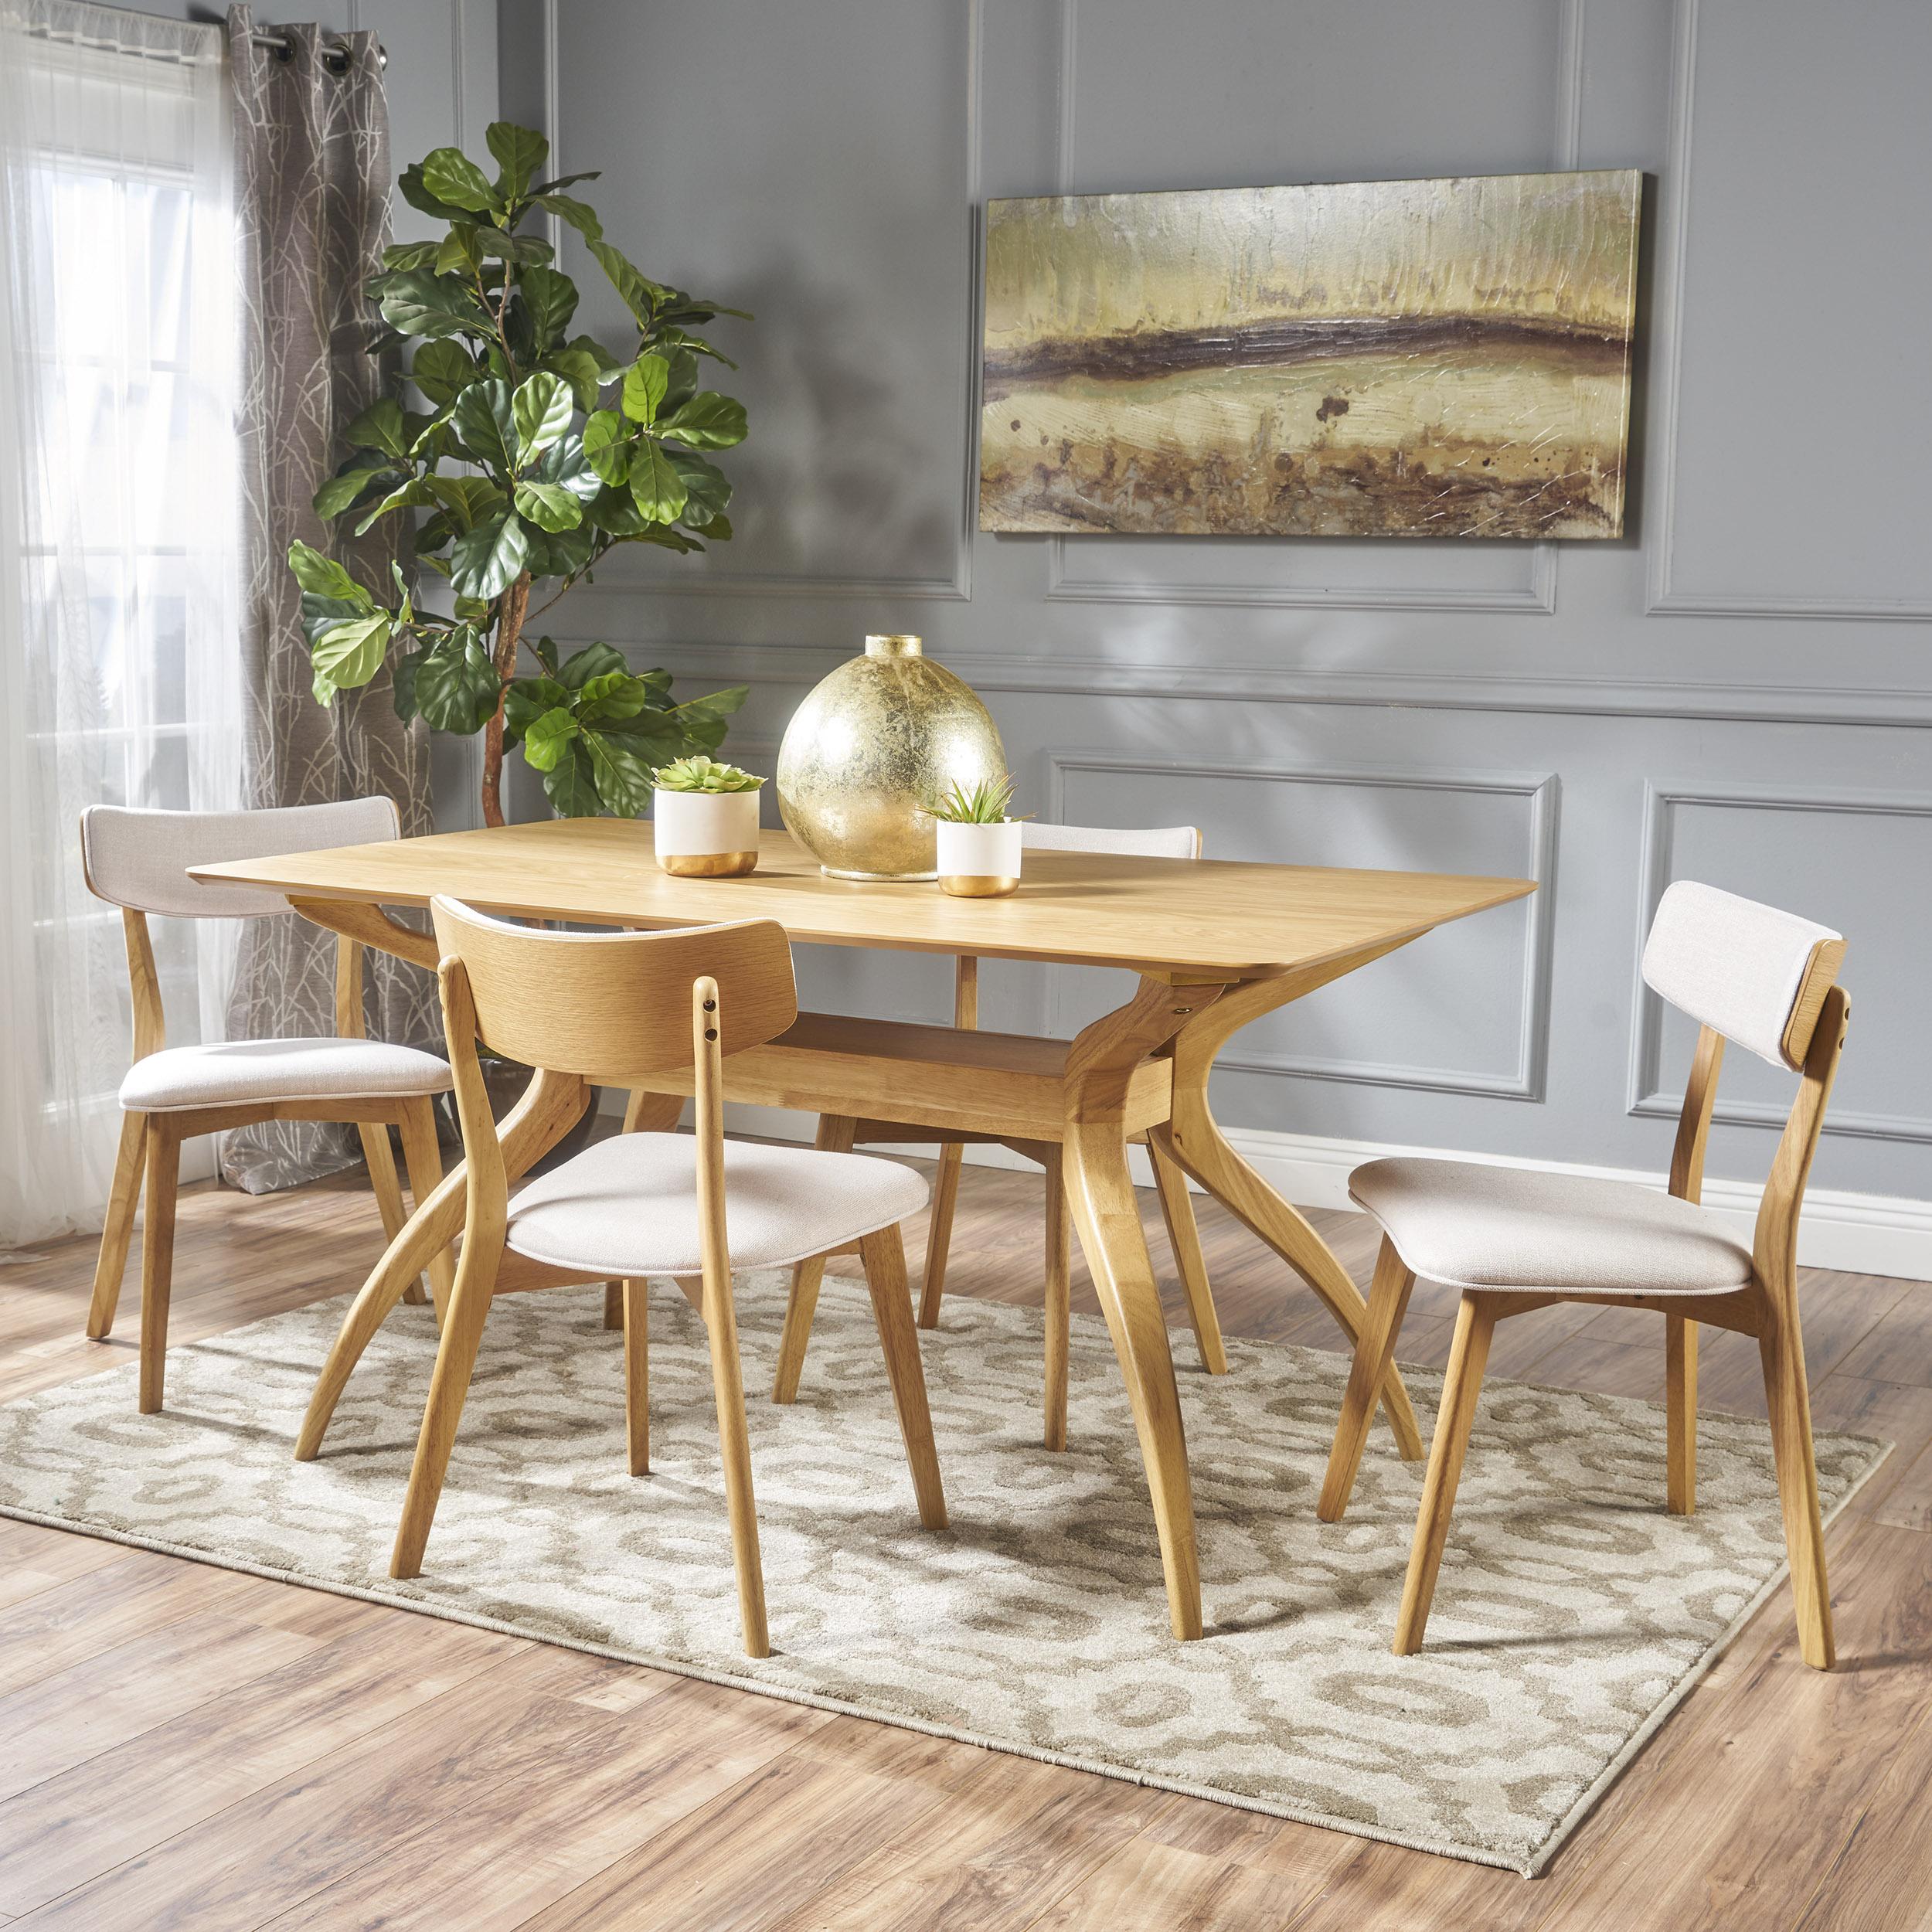 Noble House Banbury Mid Century Modern Wood 5 Piece Dining Set, Natural Oak, Light Beige